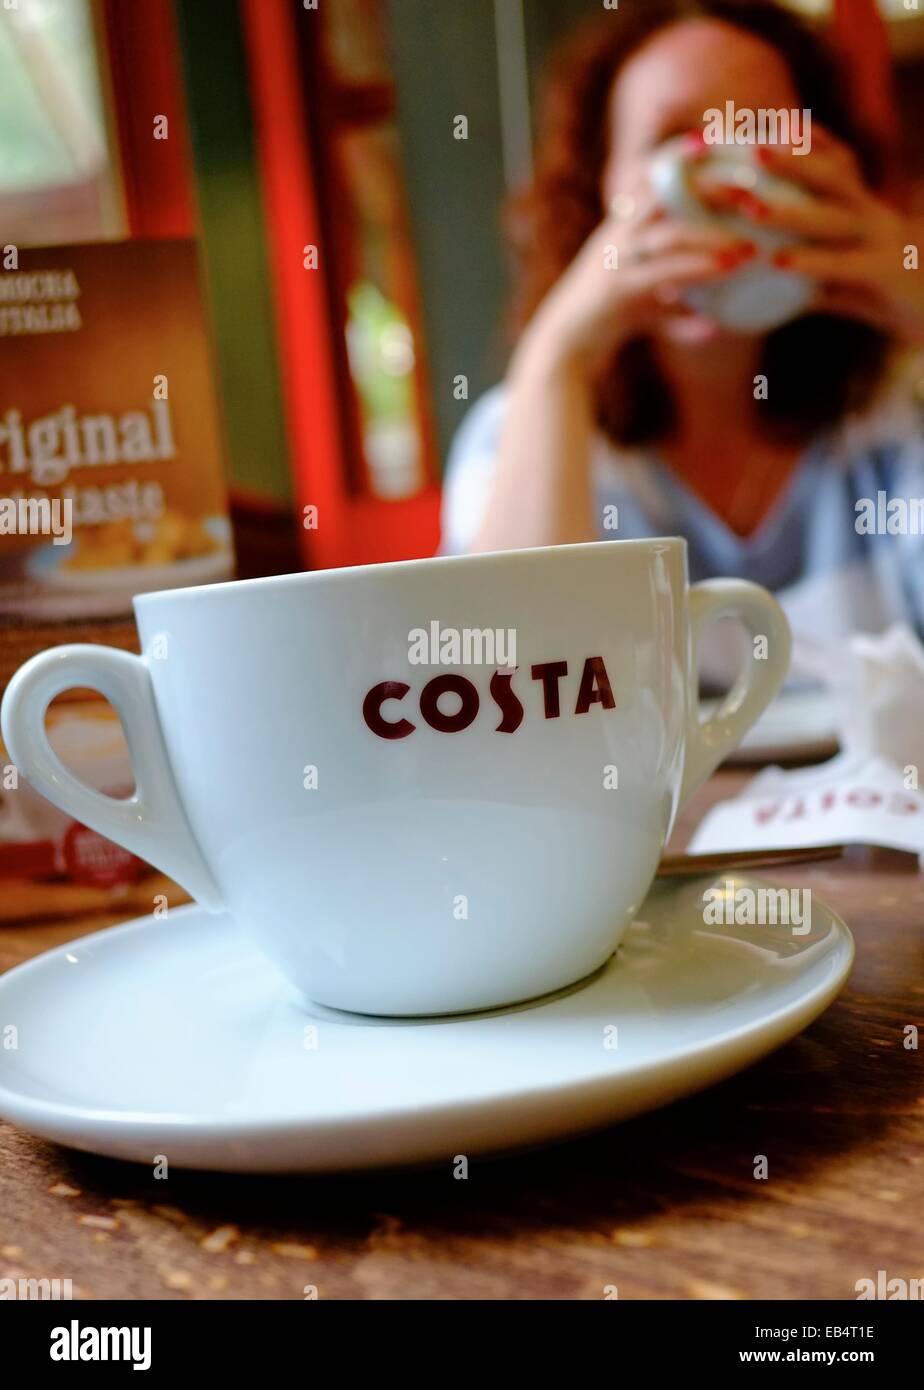 England Coffee Mug Uk Cappuccino Alamy Photo75709354 Costa Stock sBrQtCxhd